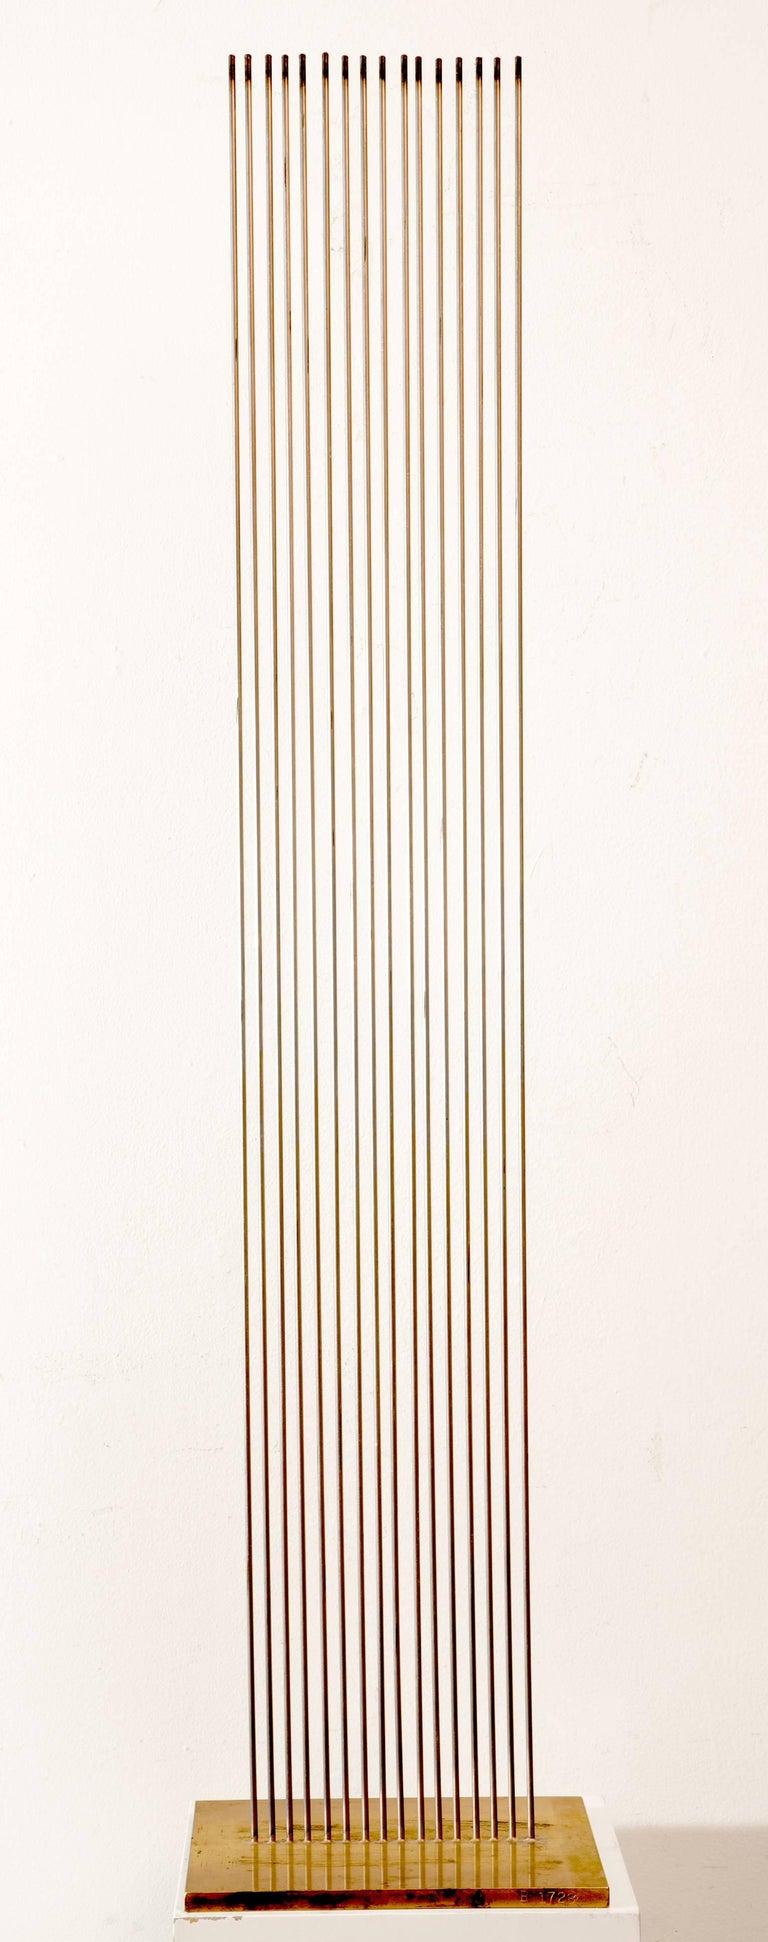 Val Bertoia Abstract Sculpture - Monel Model For Sound Screen 16 Rods